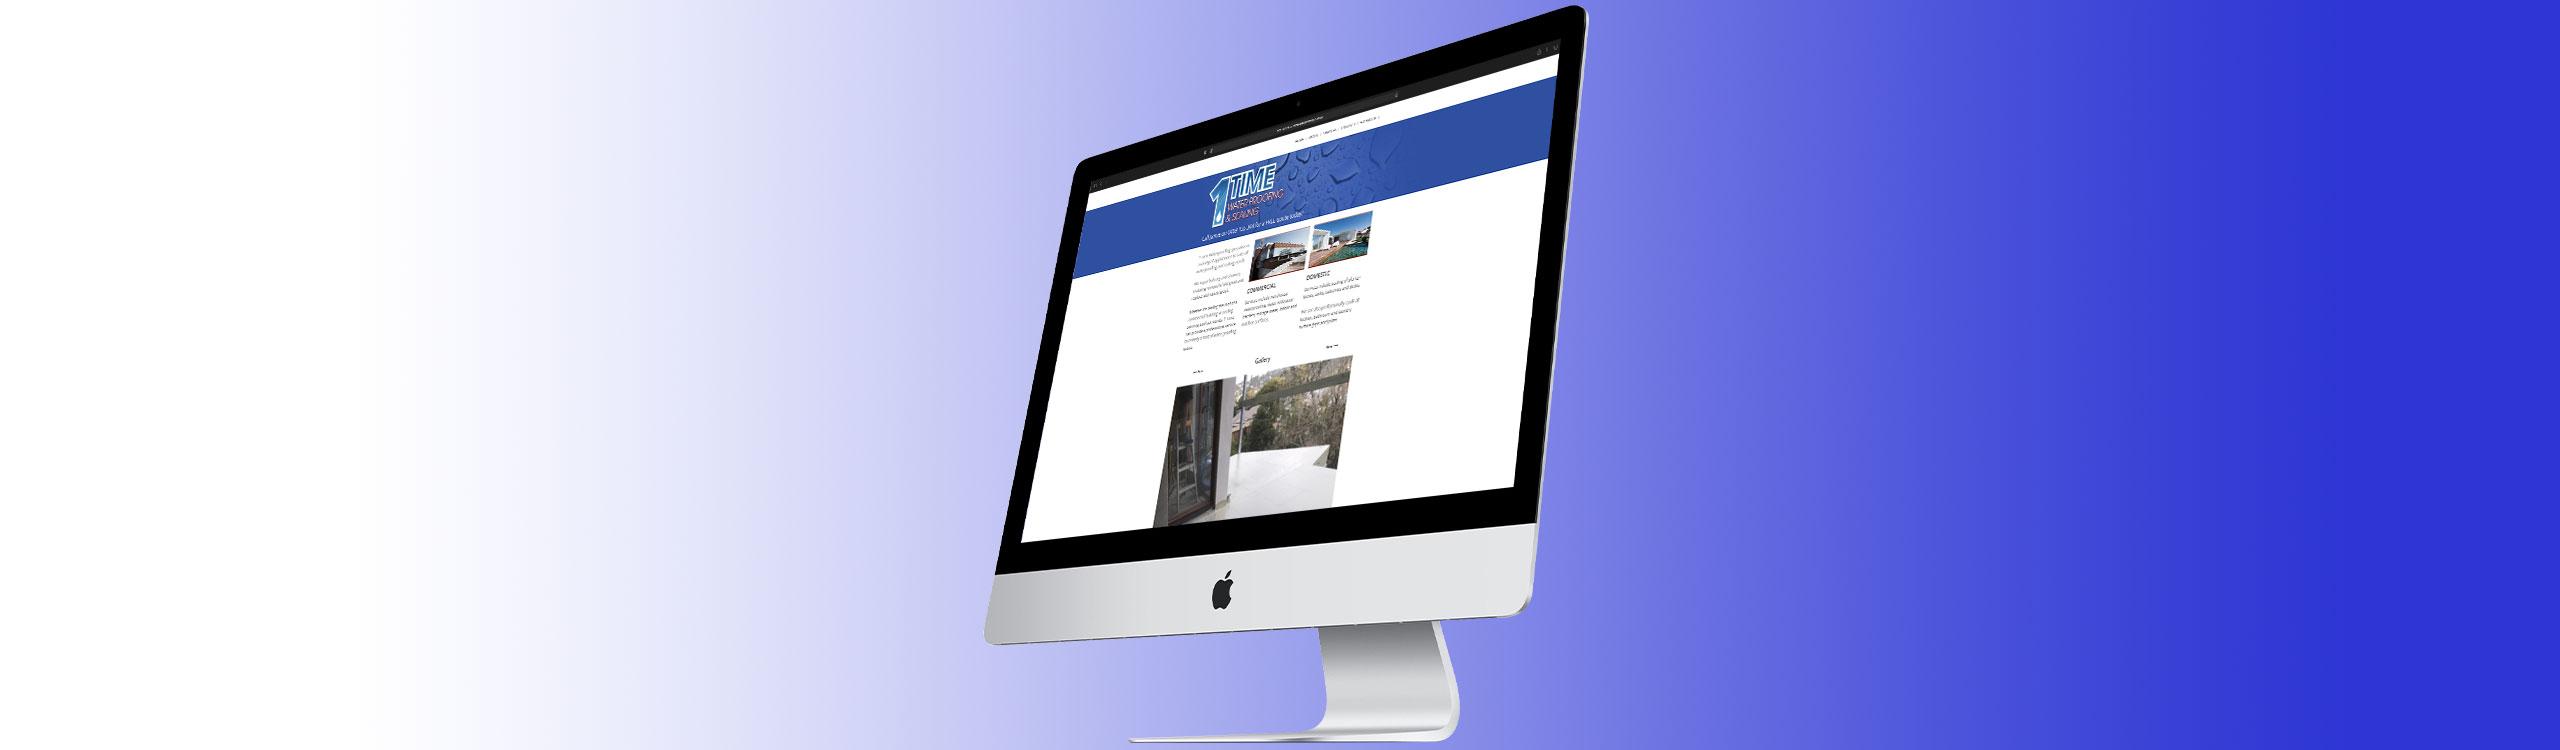 ImaginationGraphics-Websites-1Time